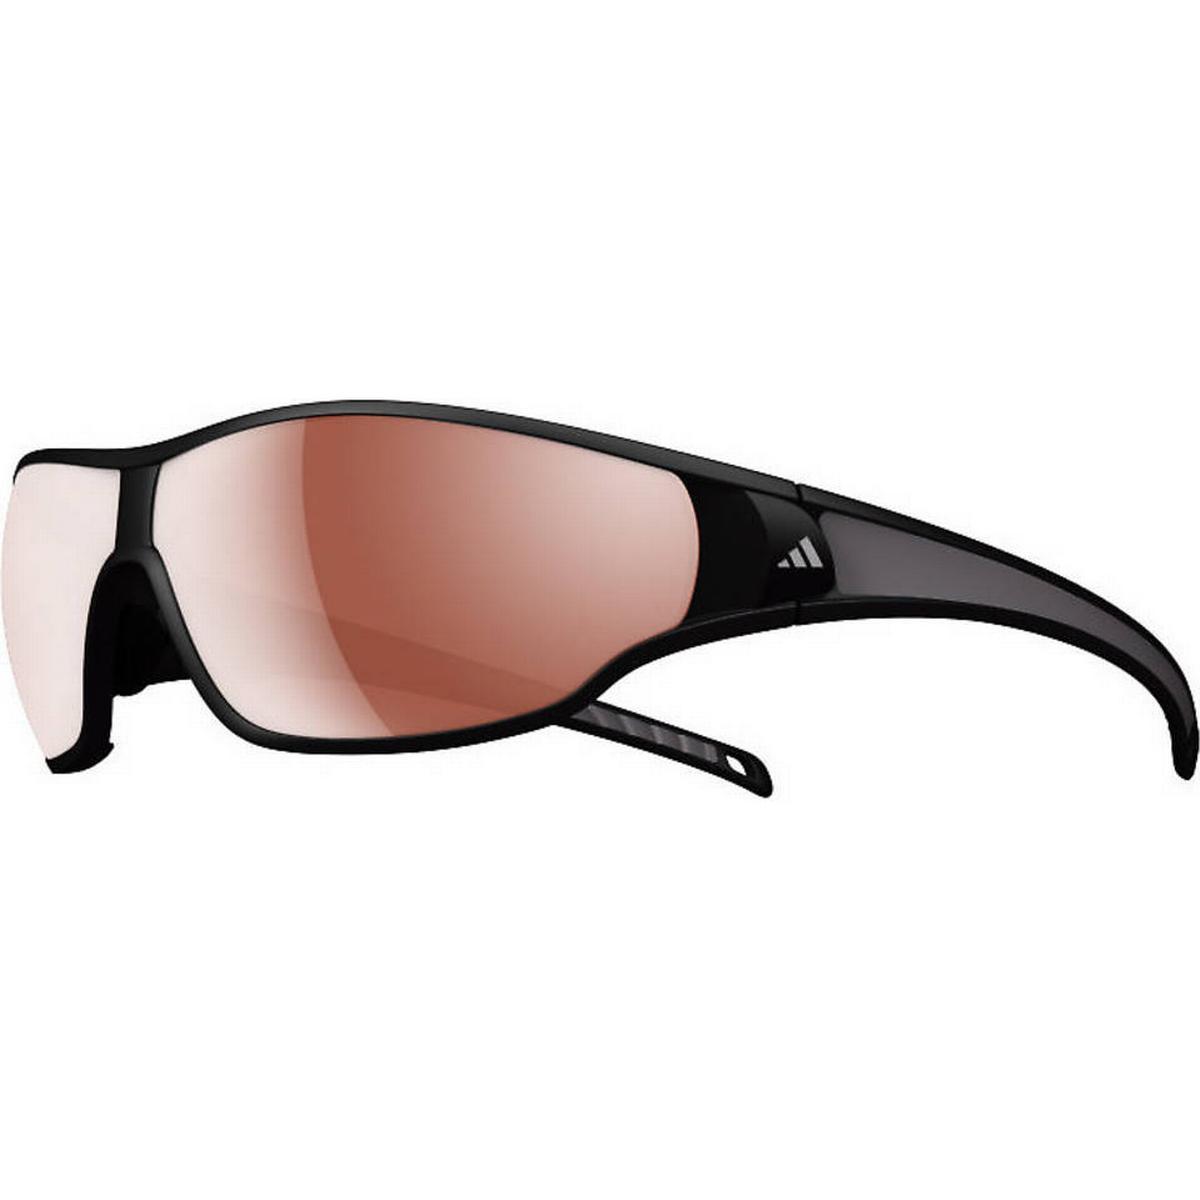 Adidas Solglasögon (1000+ produkter) hos PriceRunner • Se